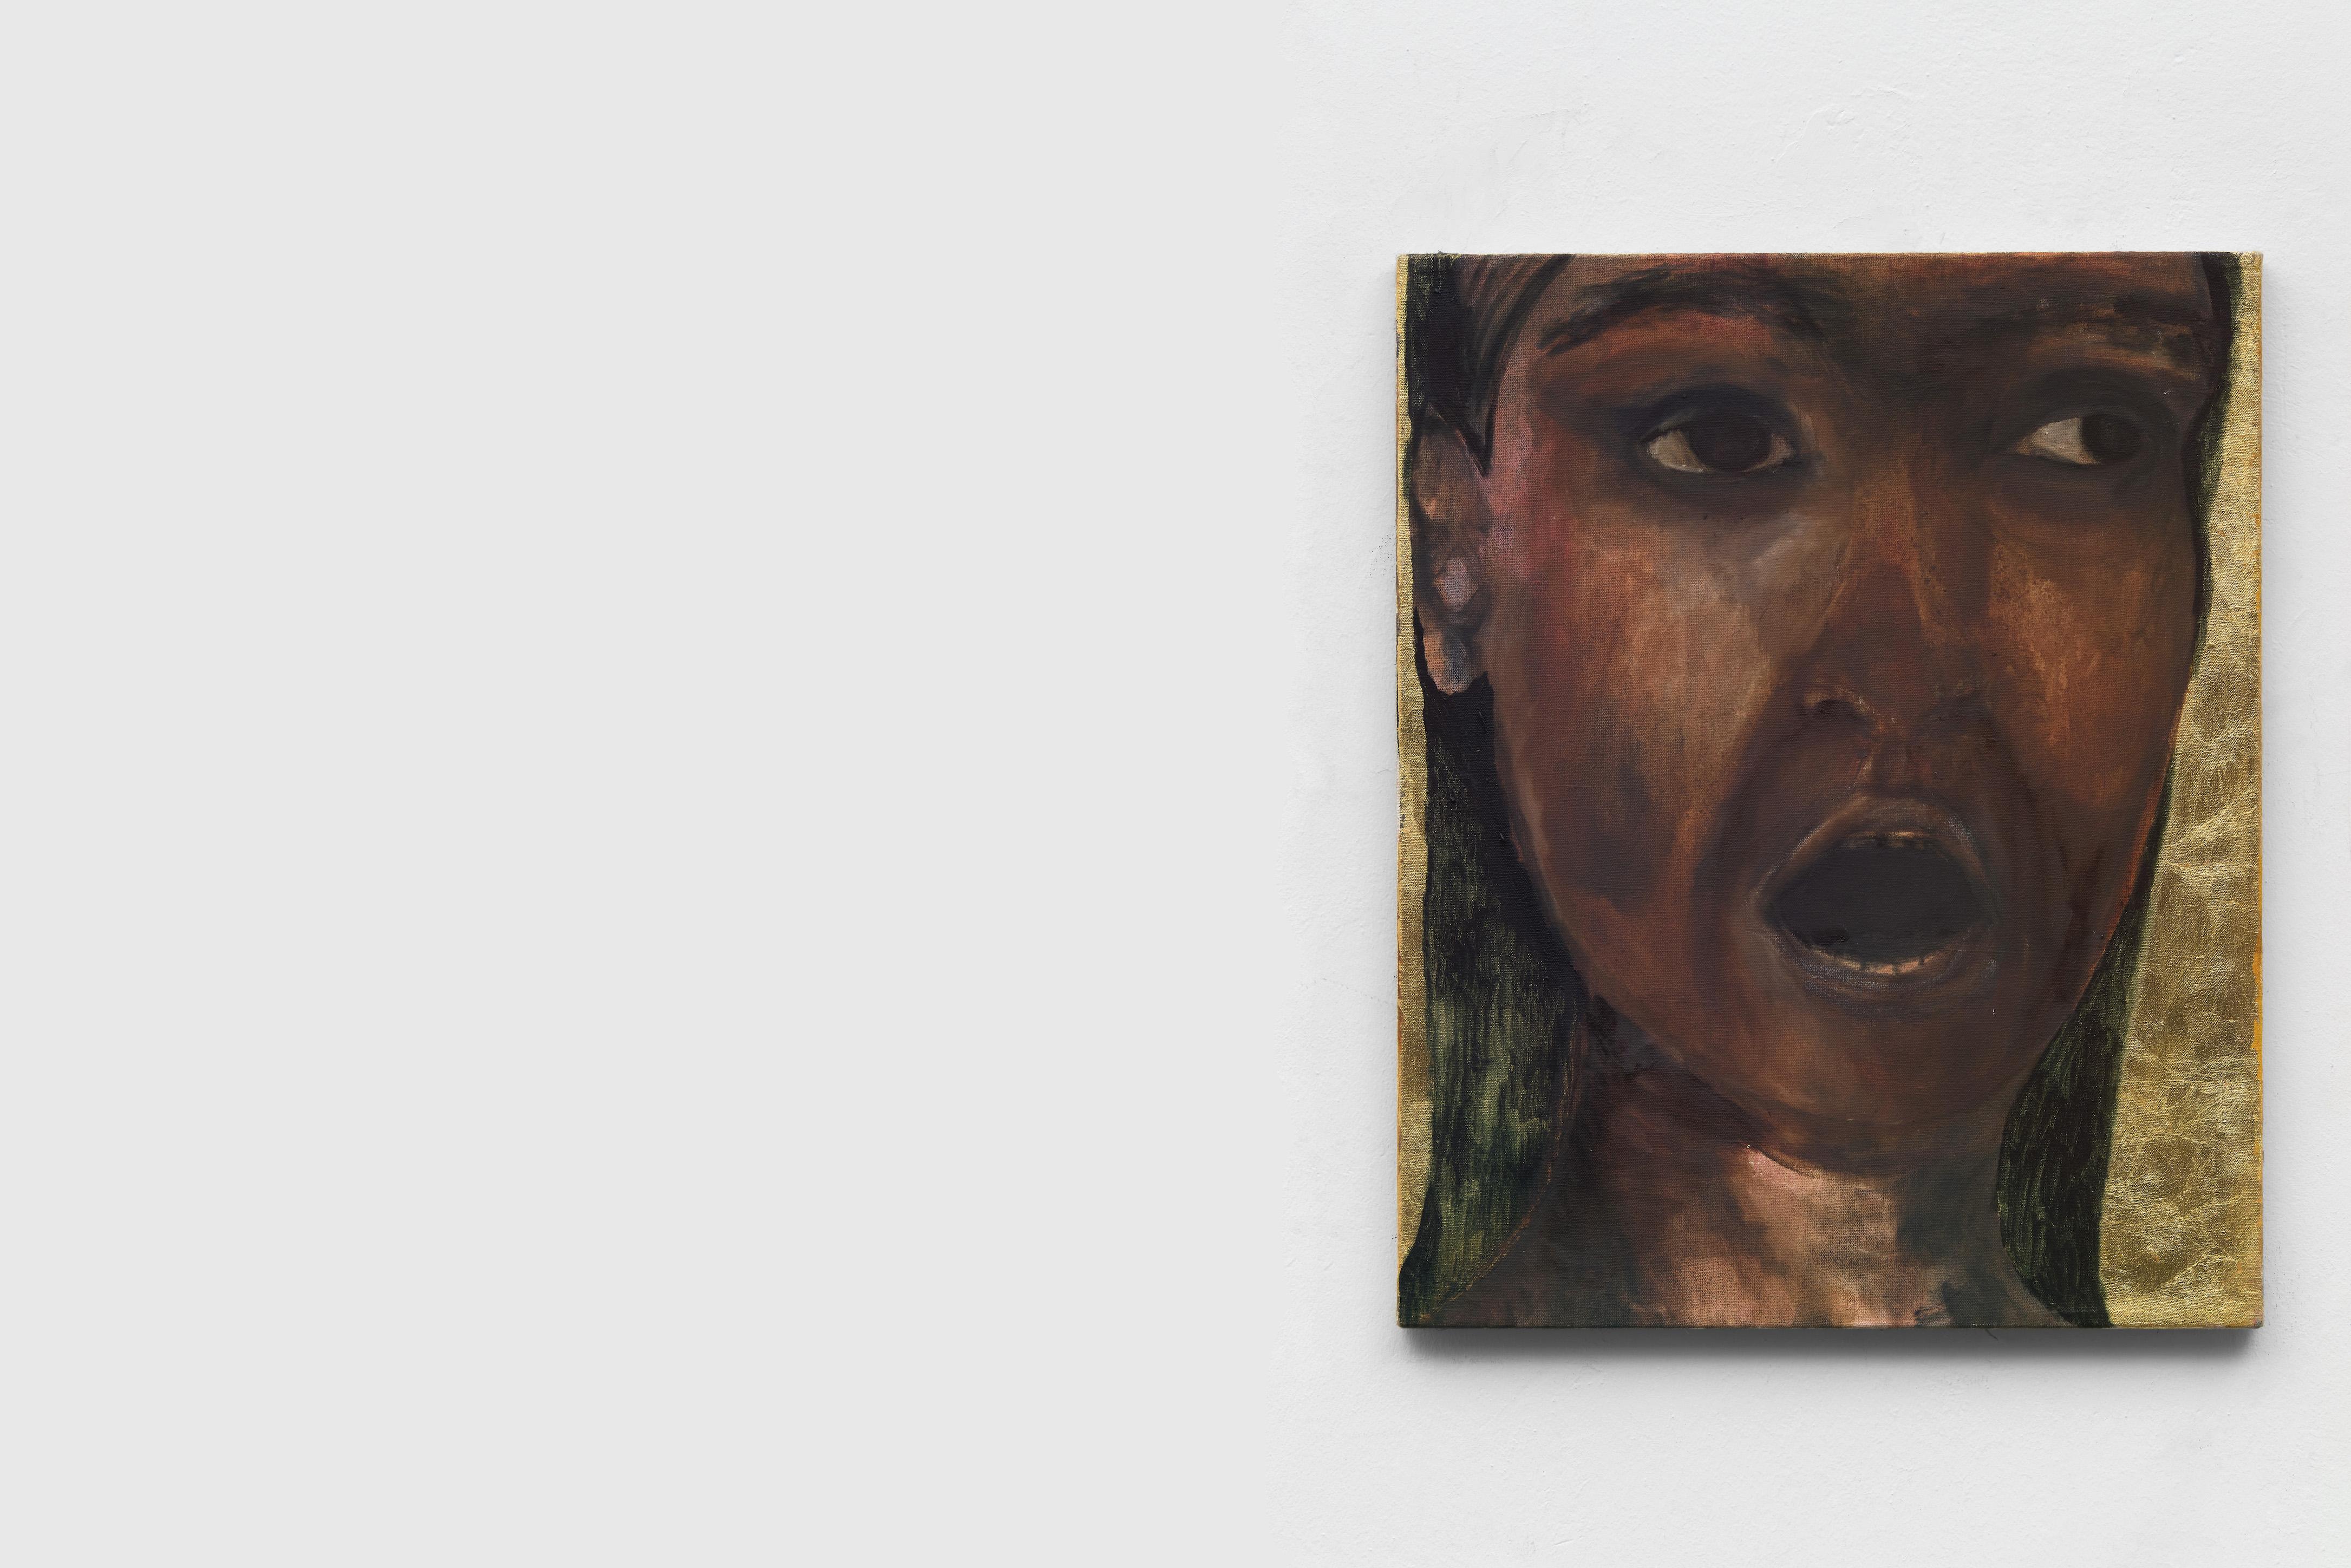 Stanislava Kovalcikova, Cautionary Tales, Golden portrait 2016 Oil on linen 66 x 52 cm, courtesy of MAMOTH